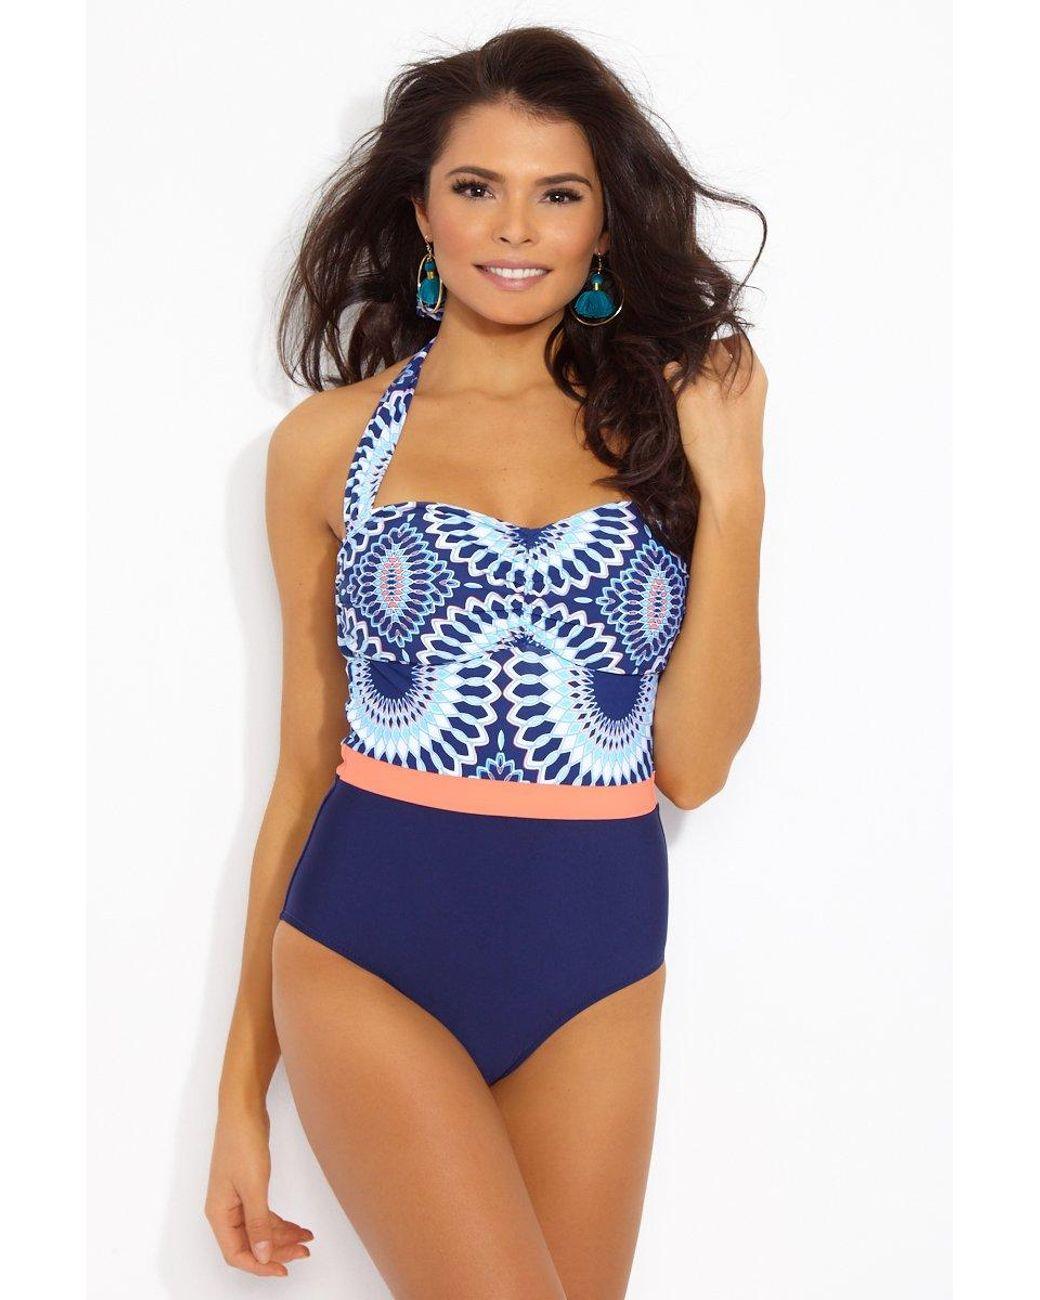 81b3e8418e Helen Jon Del Rey Retro Color Block One Piece Swimsuit - Laguna in Blue -  Lyst